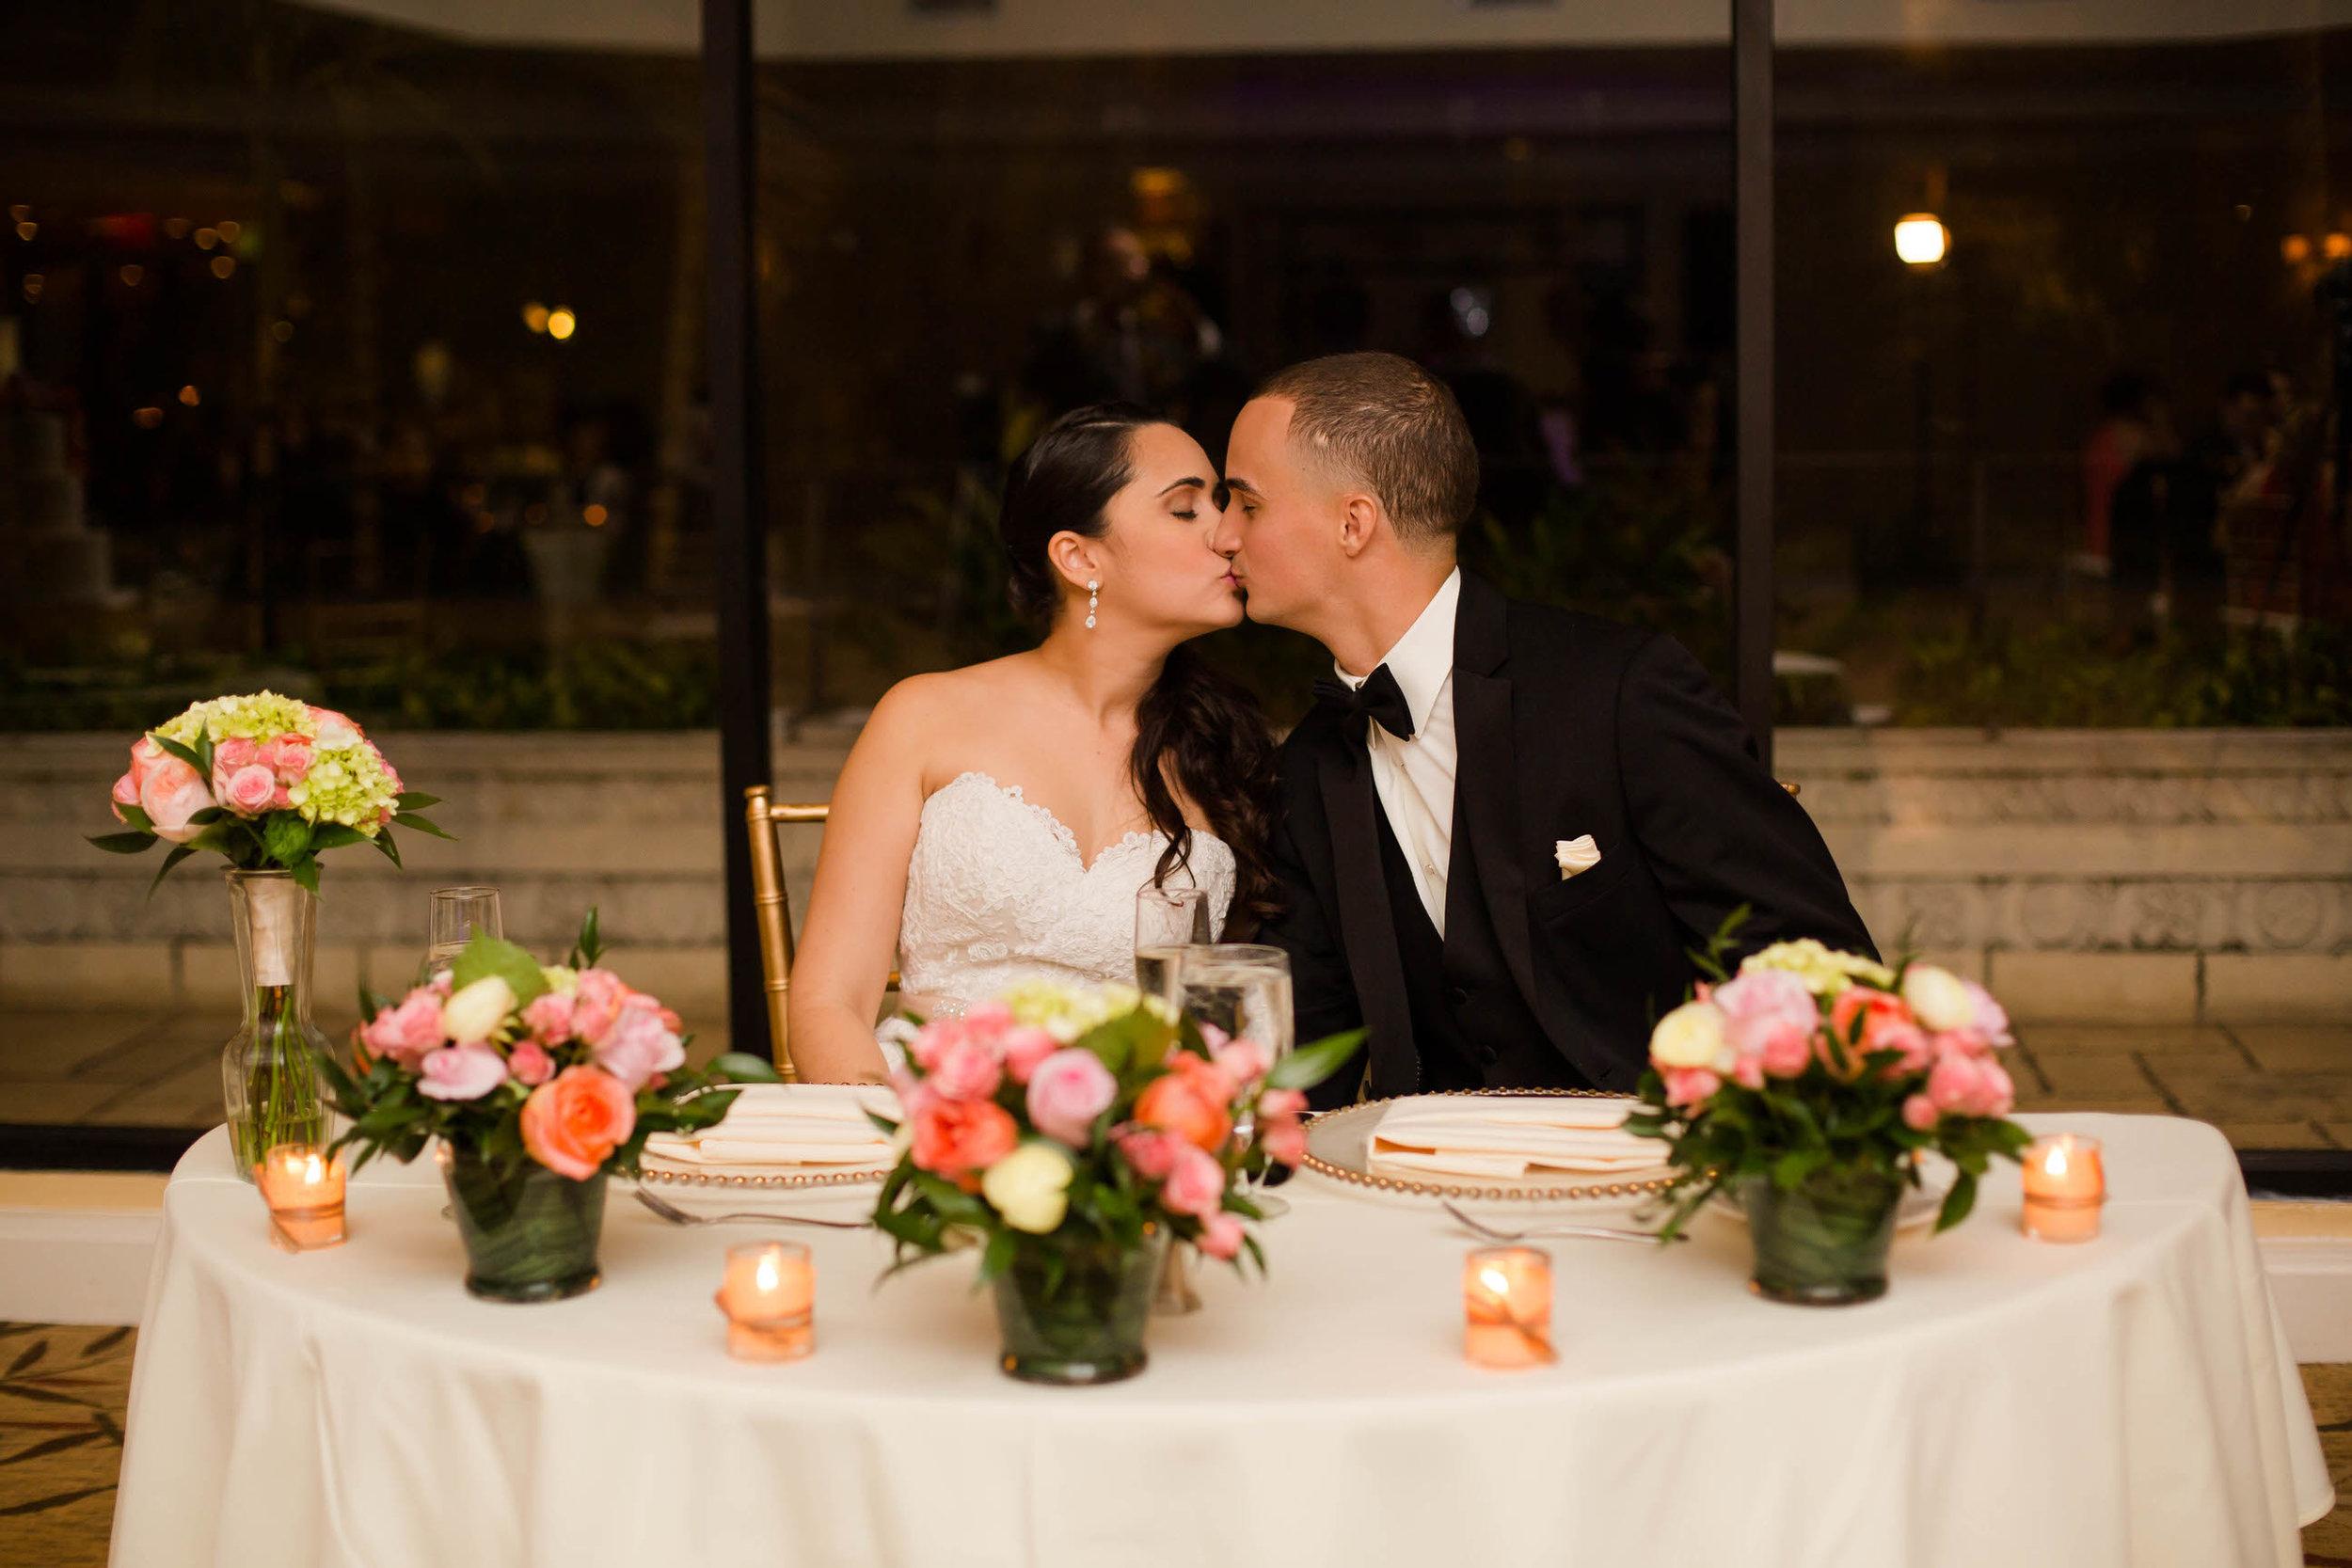 bride-groom-kiss-reception-tiny-house-photo.jpg